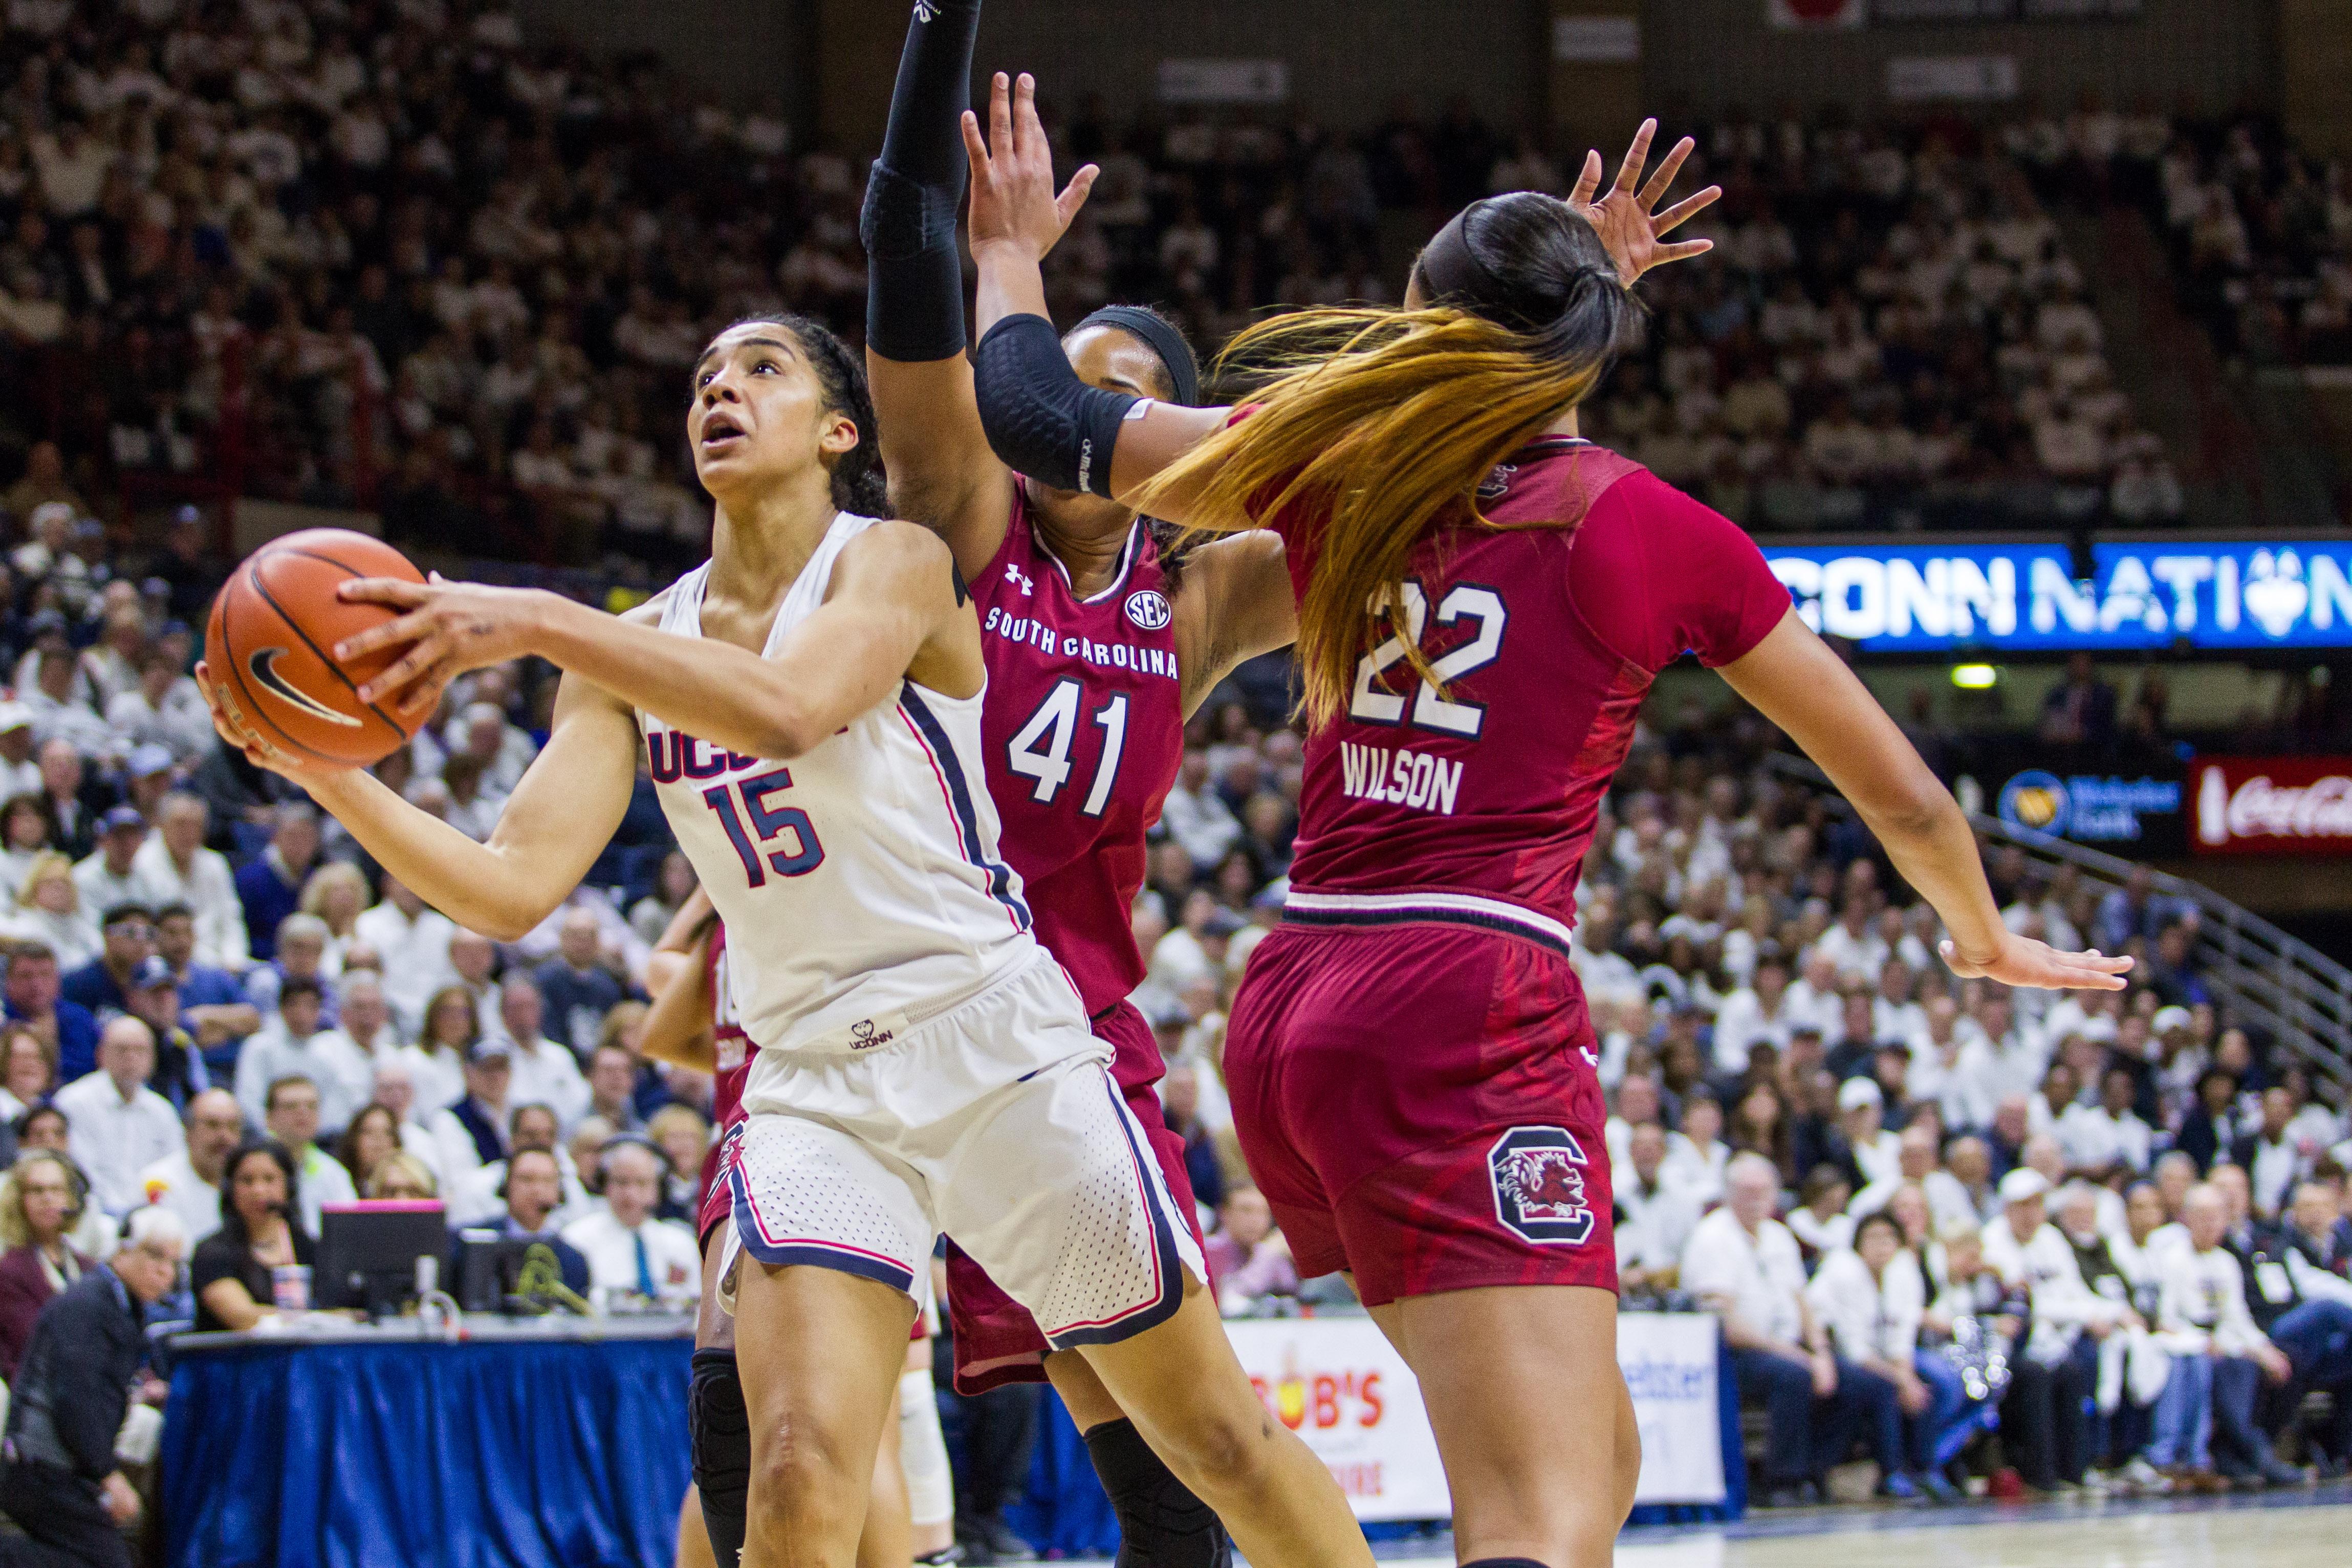 COLLEGE BASKETBALL: FEB 13 Women's – South Carolina at UConn